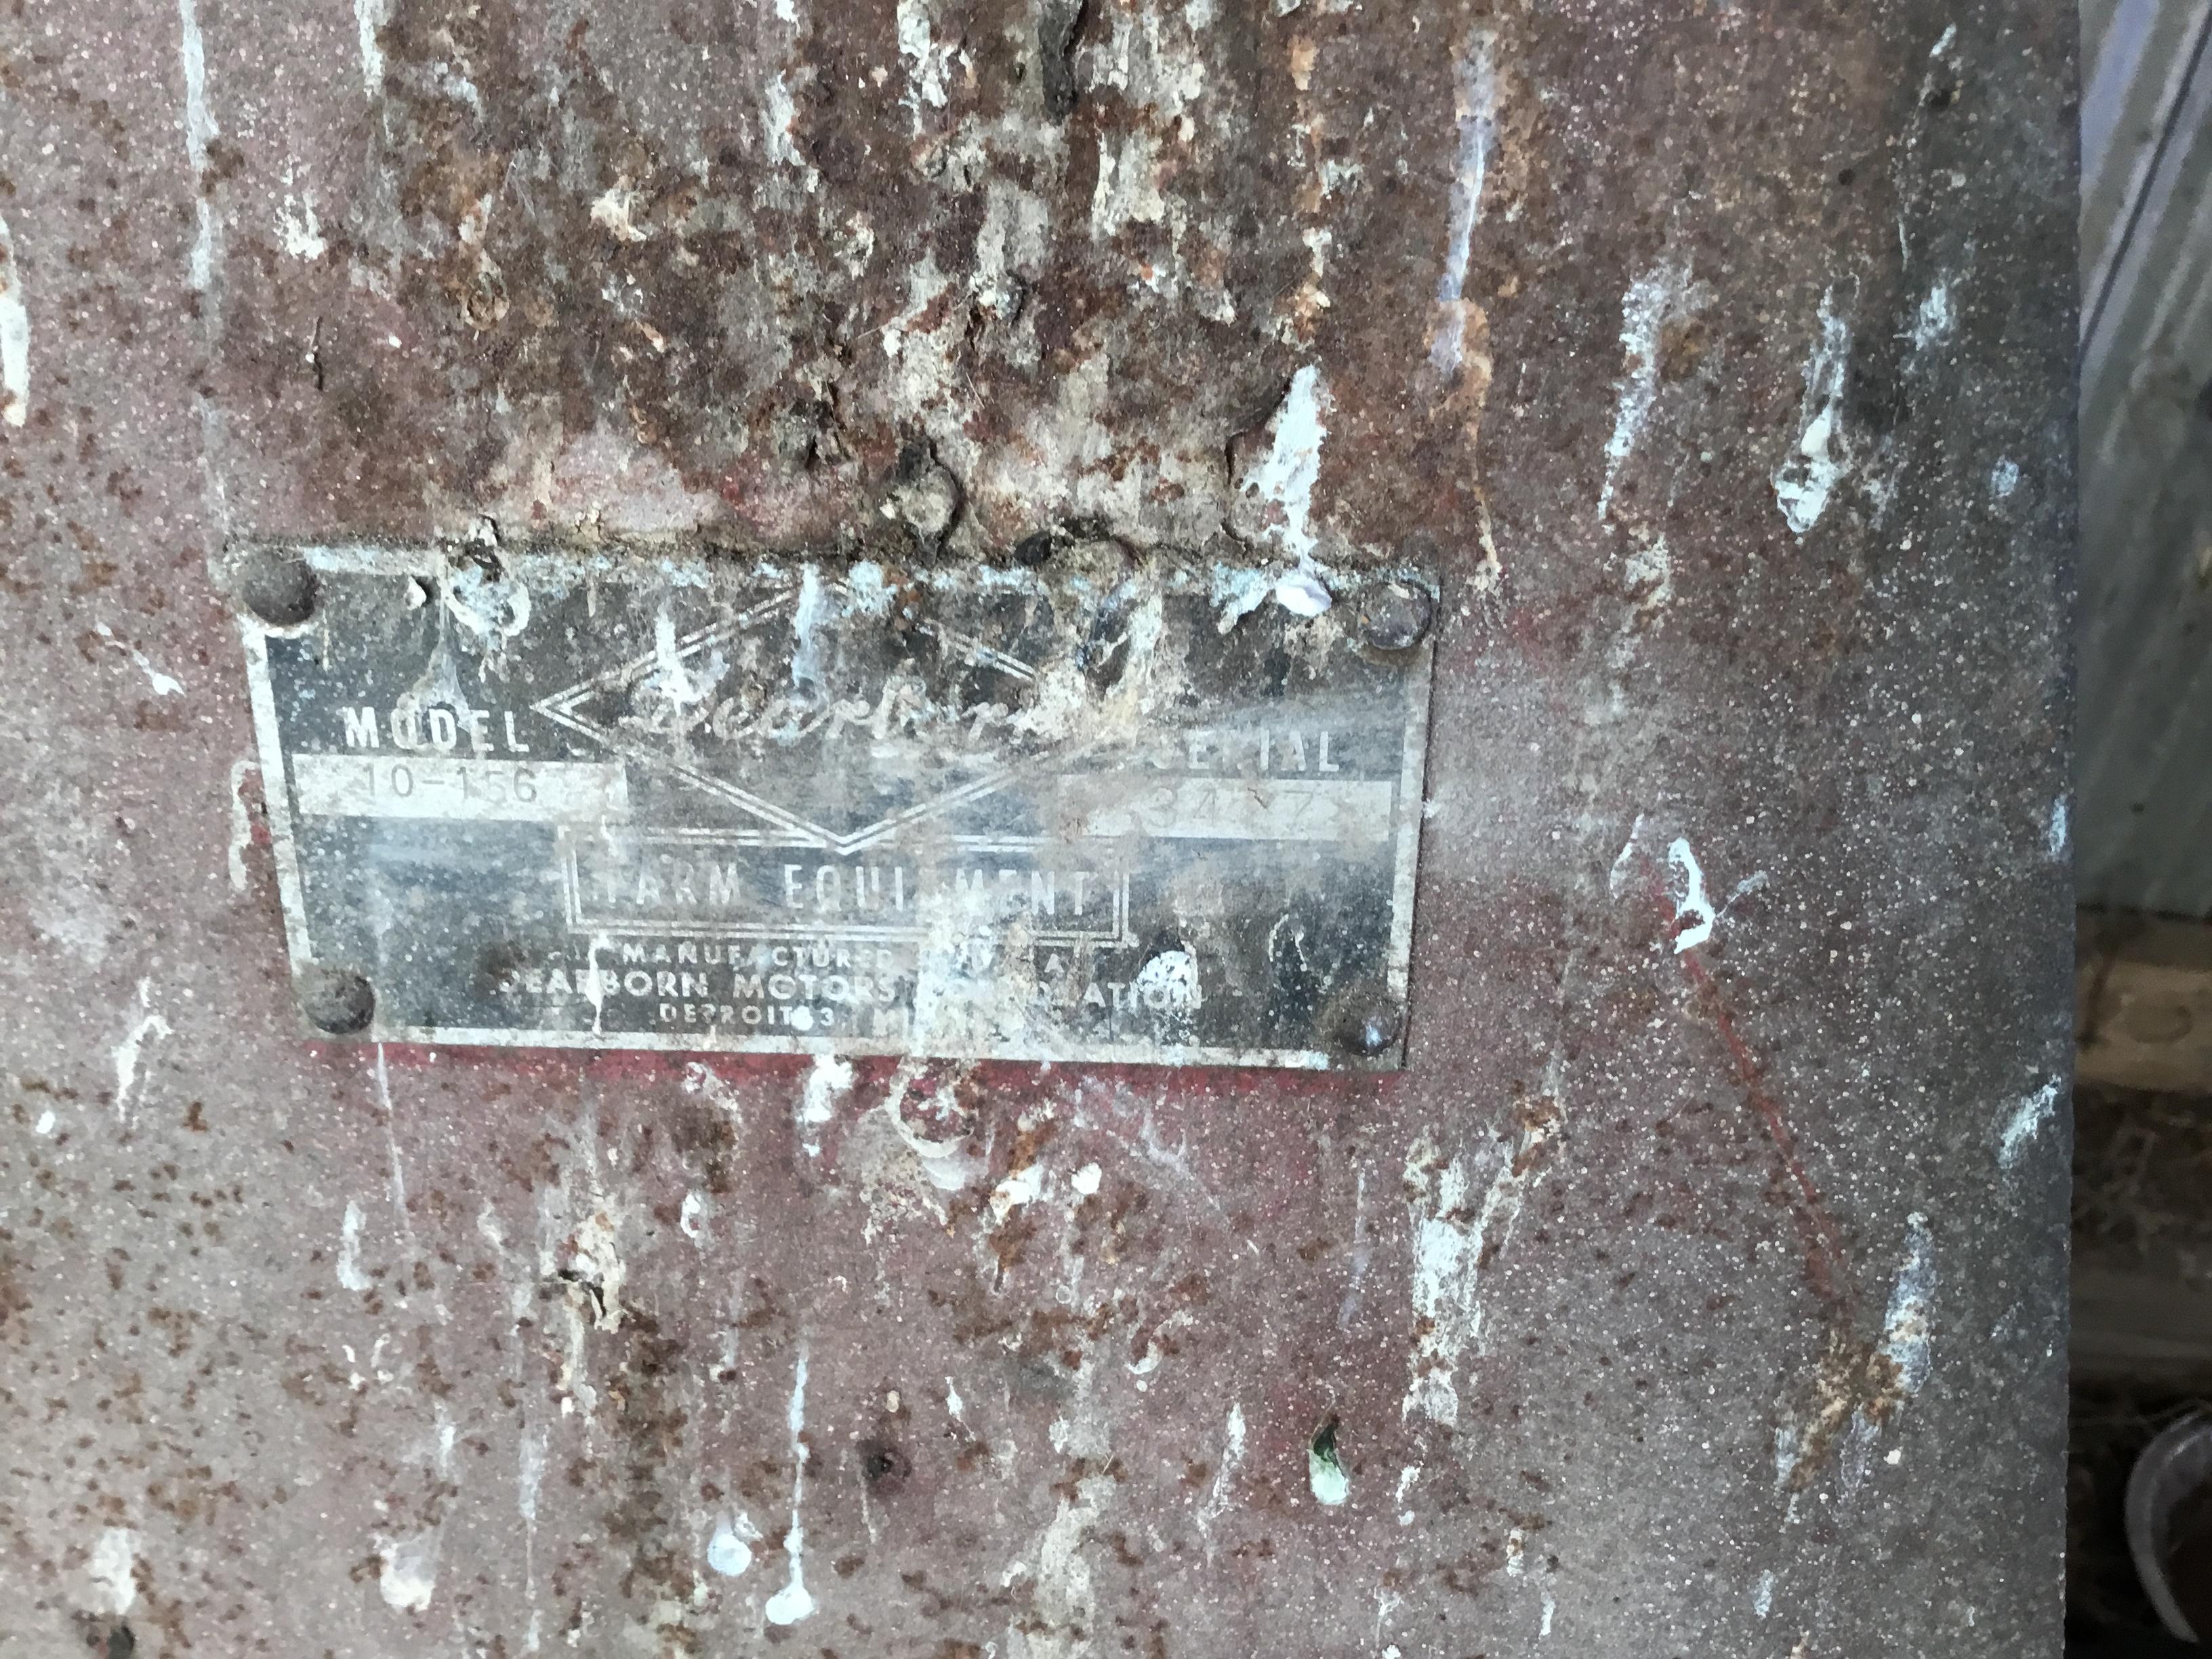 Ferguson 3 Pt. Hitch, 2 Bottom Plow - Image 2 of 4